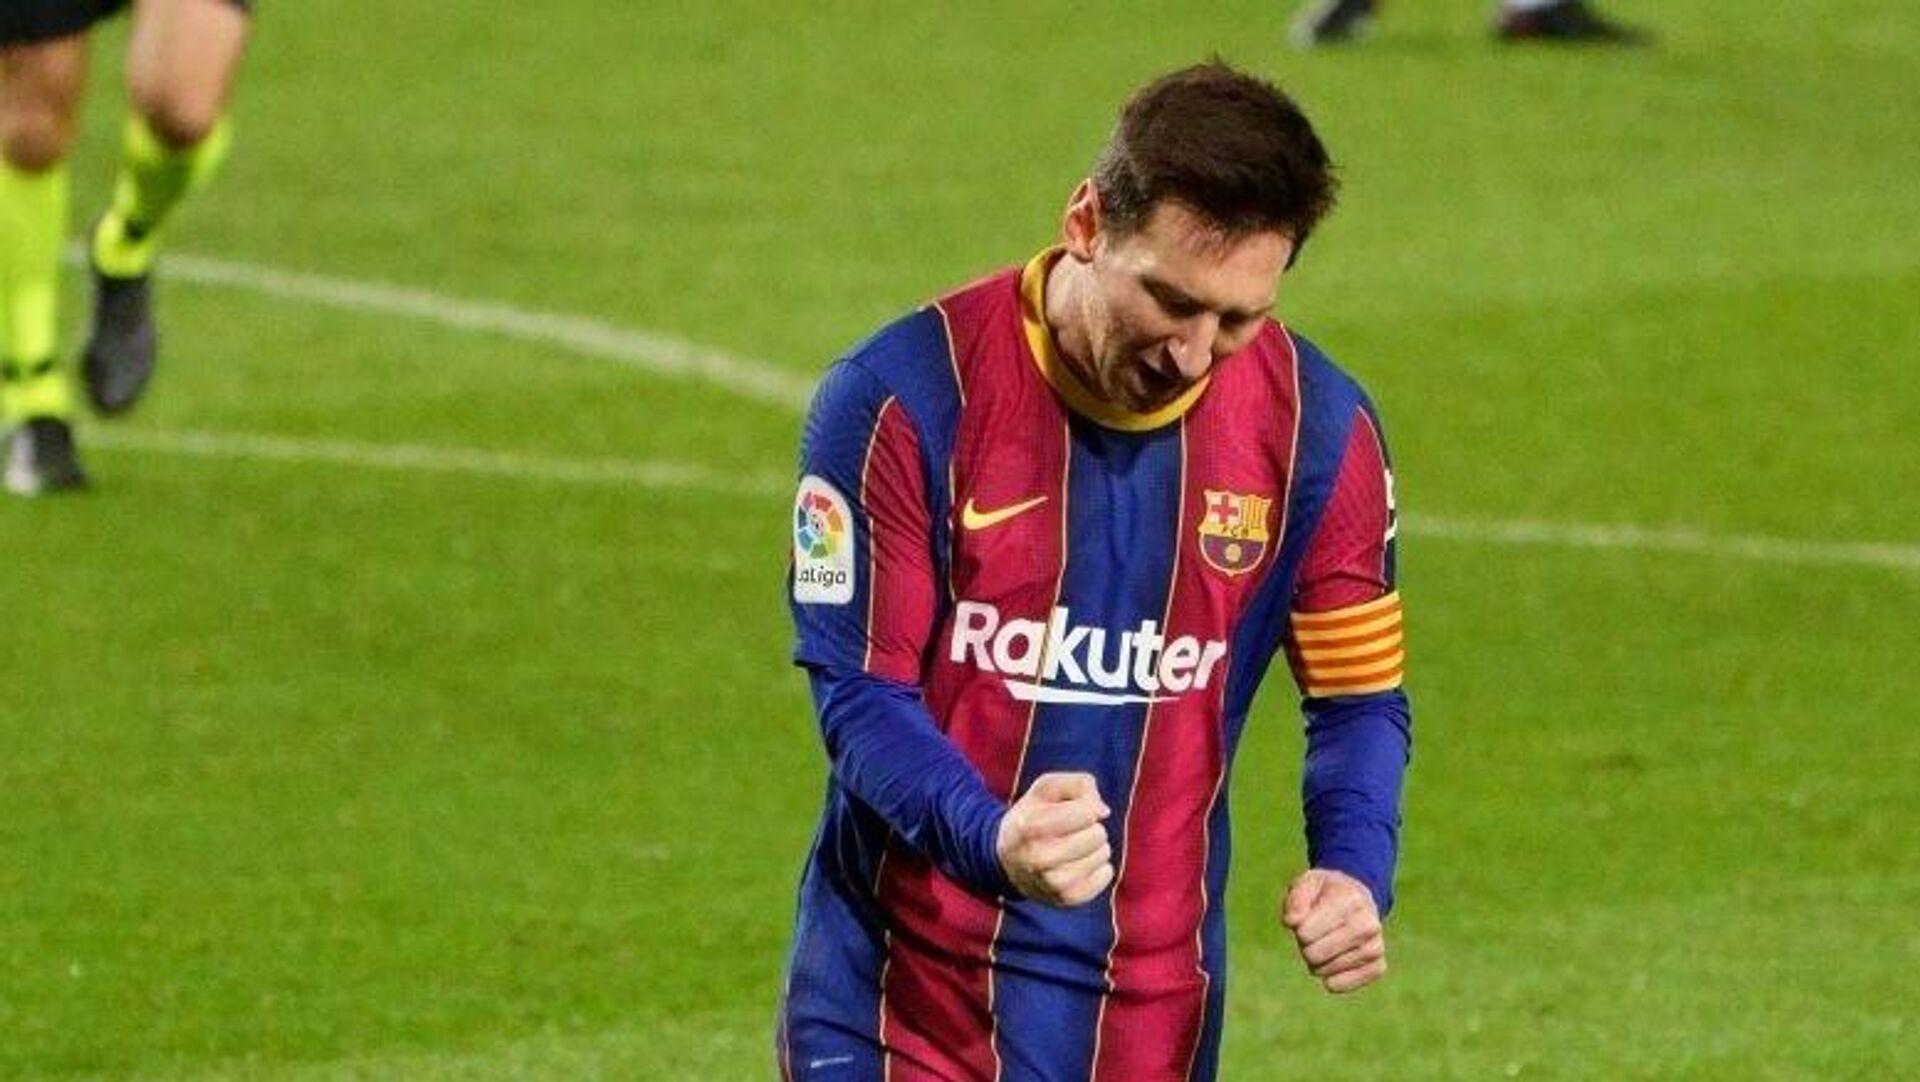 Lionel Messi, jugador argentino del Fútbol Club Barcelona - Sputnik Mundo, 1920, 29.04.2021